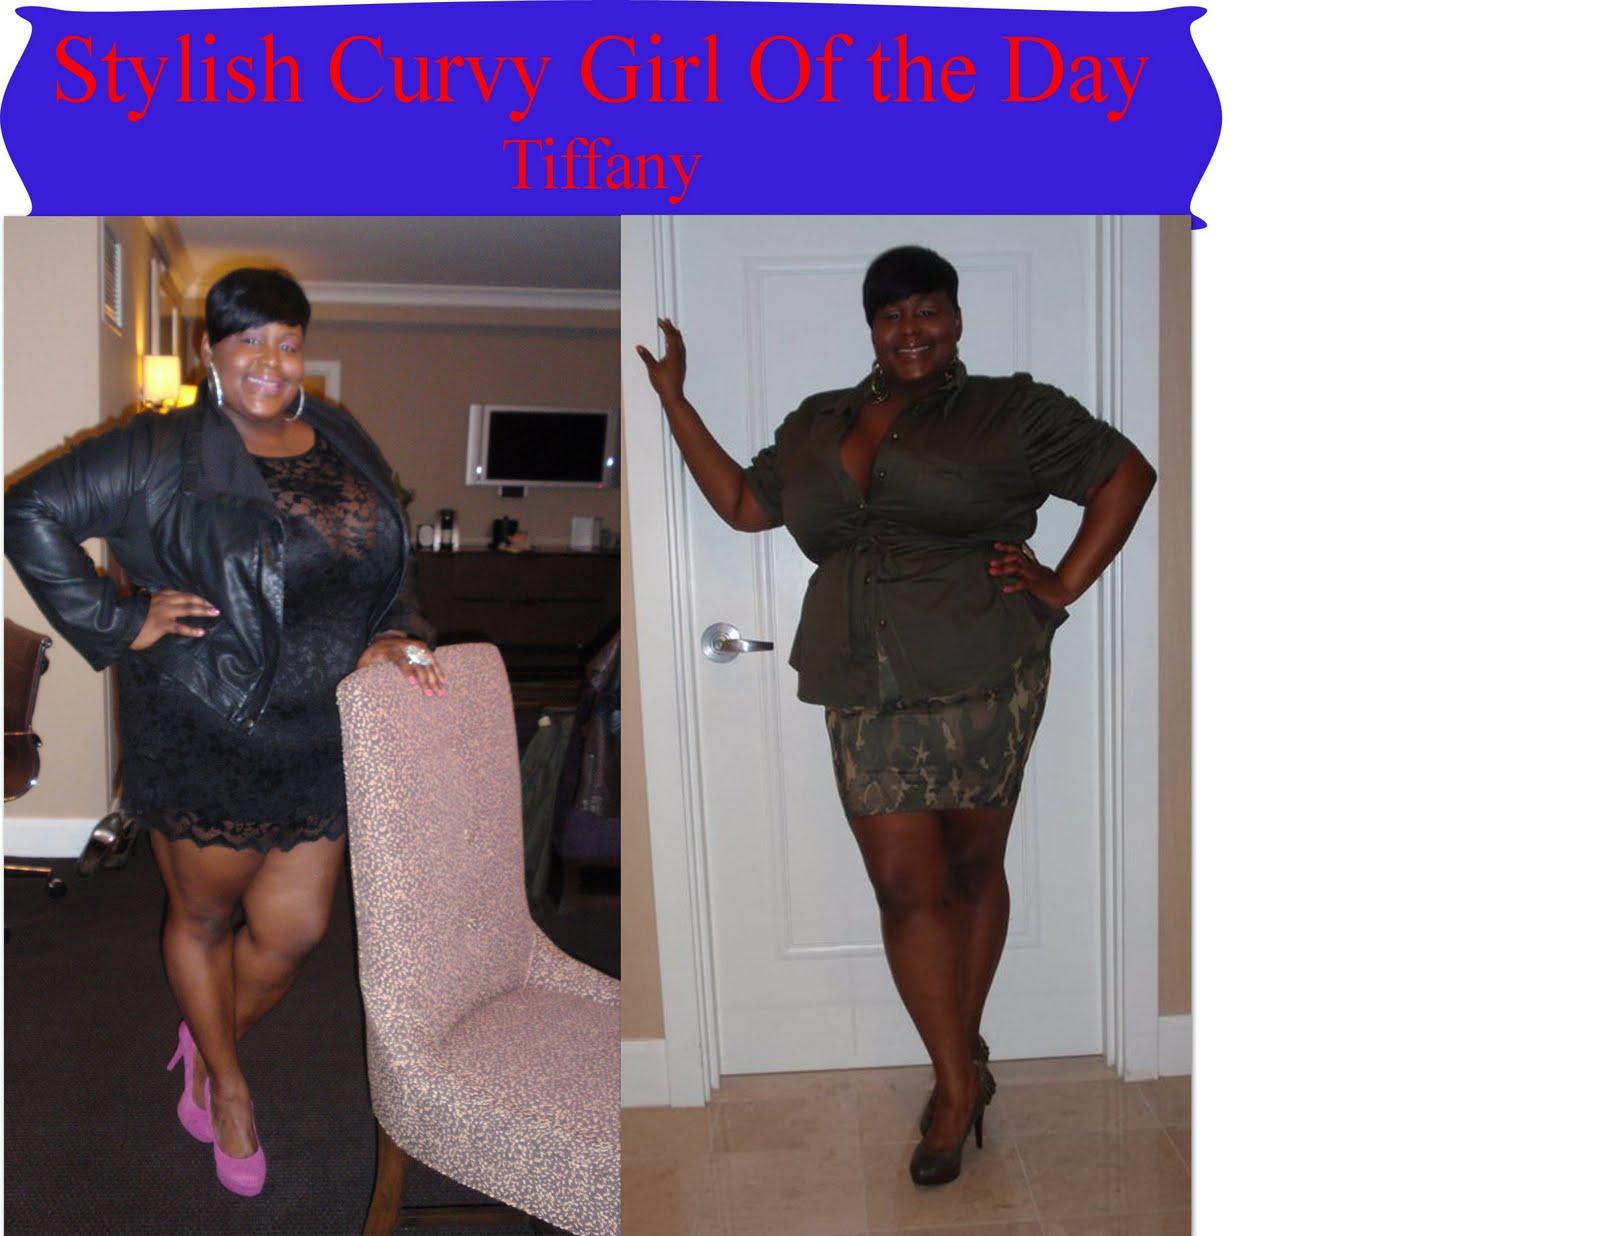 Inez Busty Minimalist stylish curvy girl of the day: tiffany   stylish curves